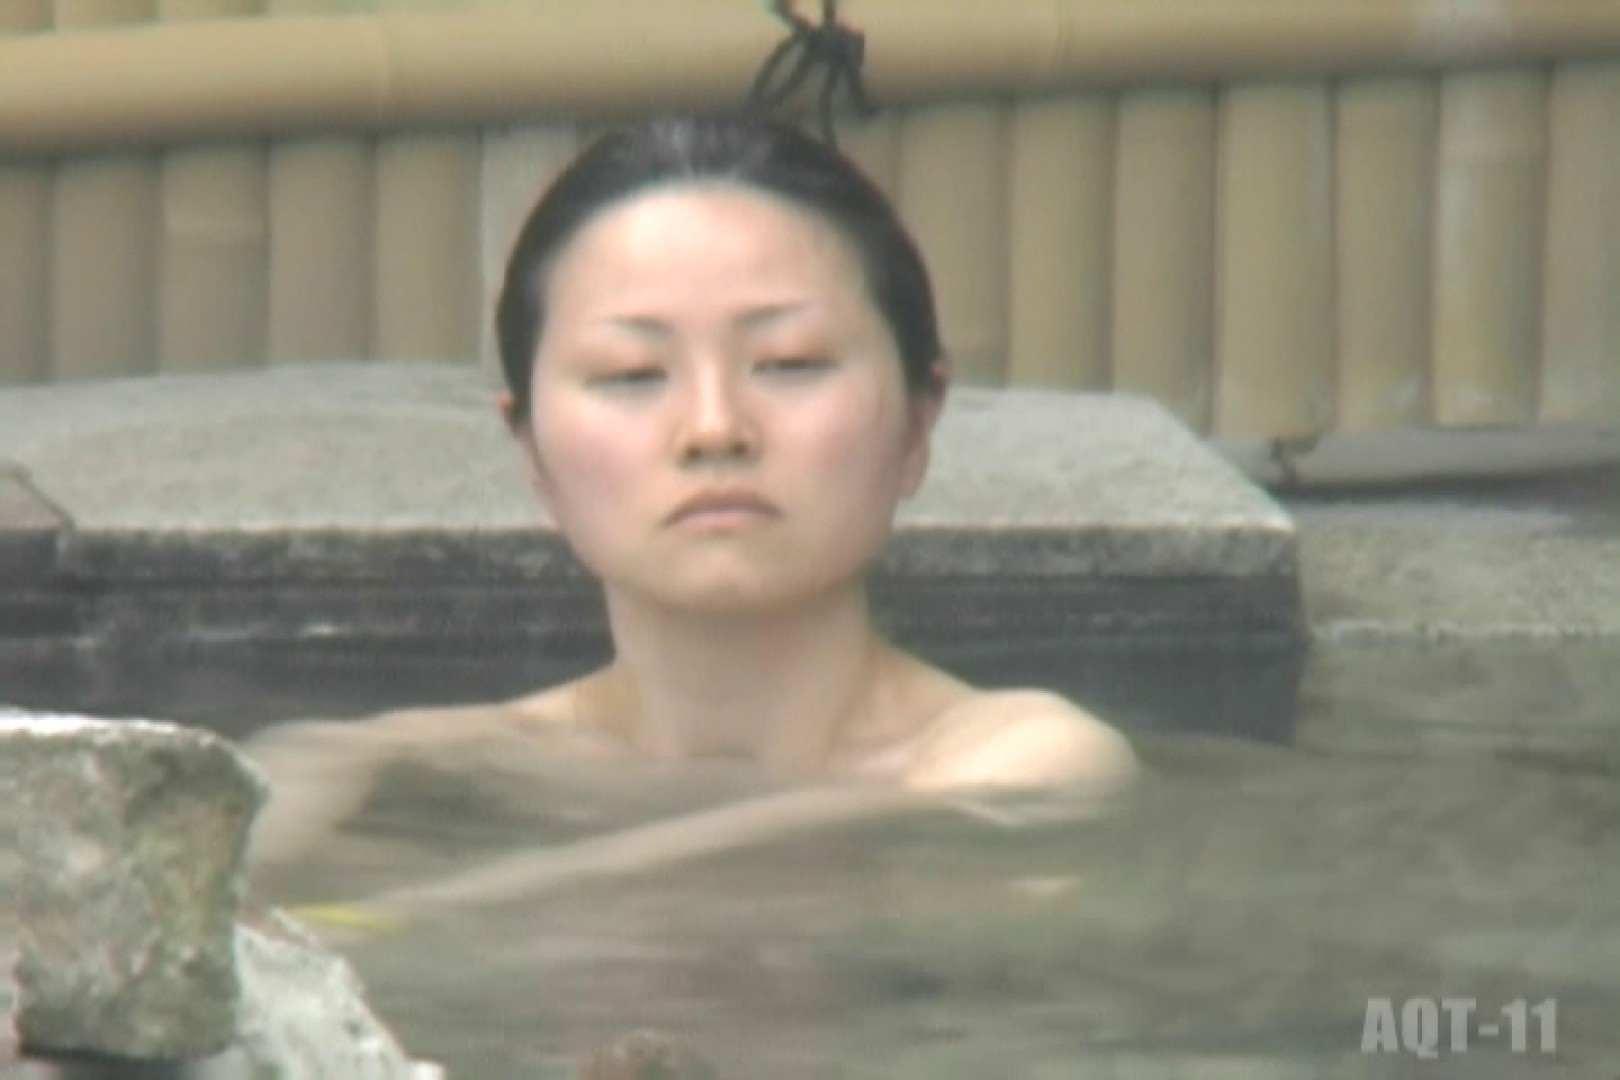 Aquaな露天風呂Vol.802 OLエロ画像 盗撮セックス無修正動画無料 57PICs 44